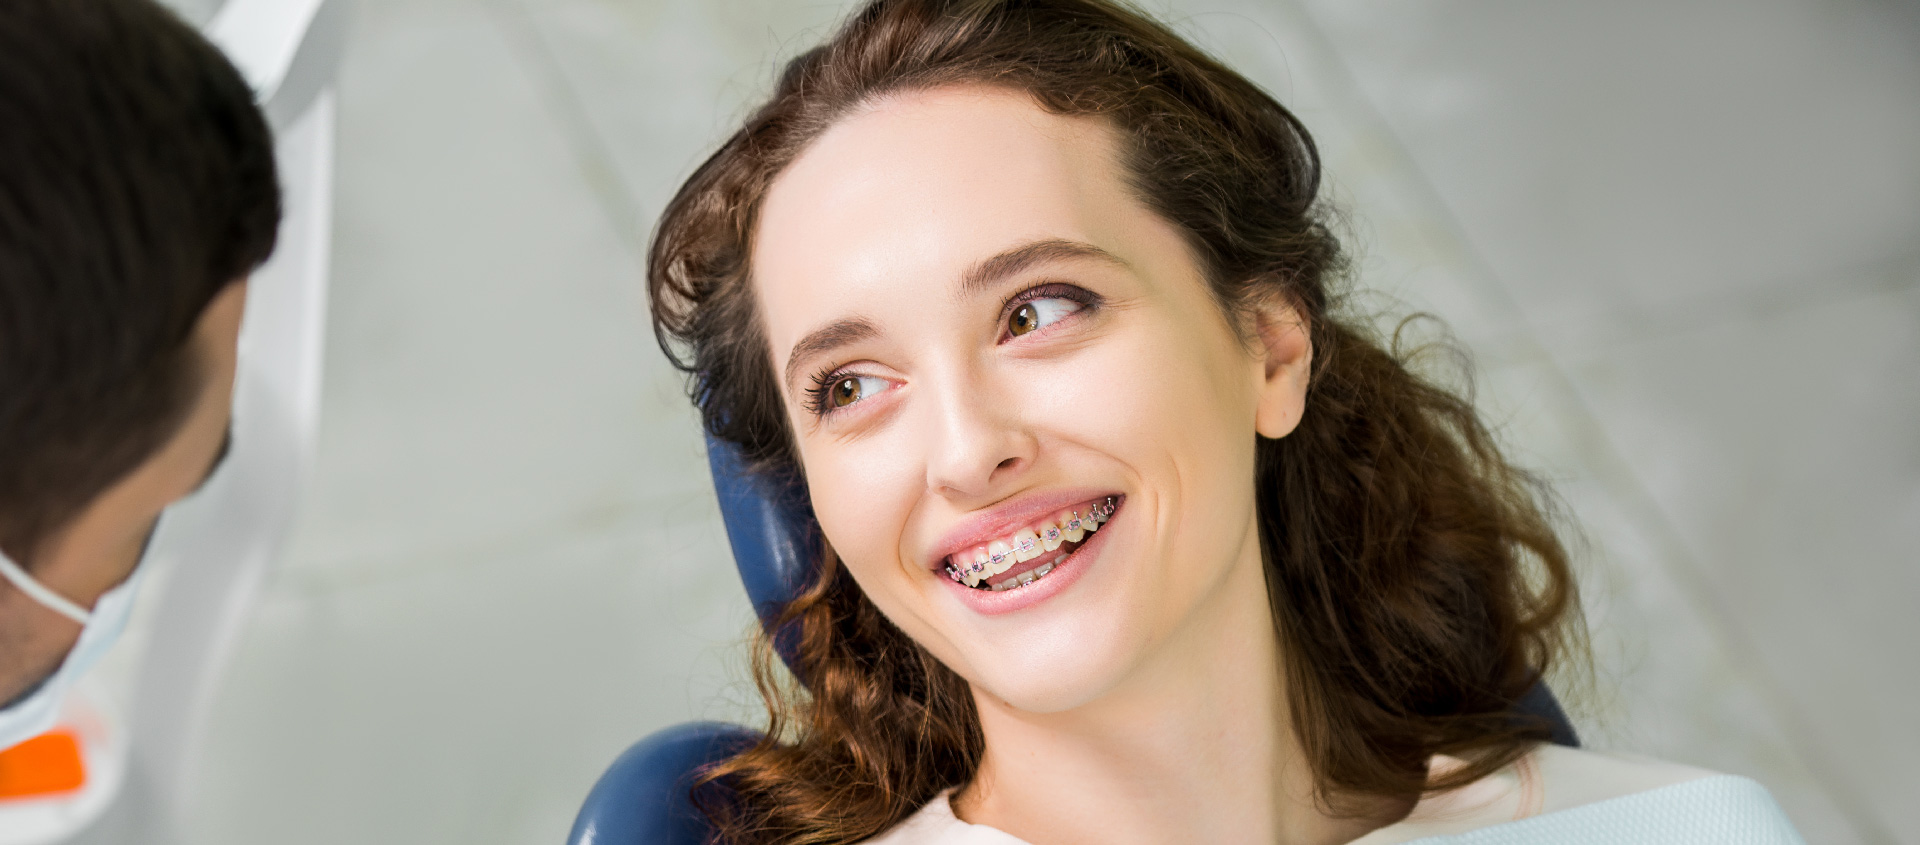 Orthodontist for improve the smile near to brandon,fl